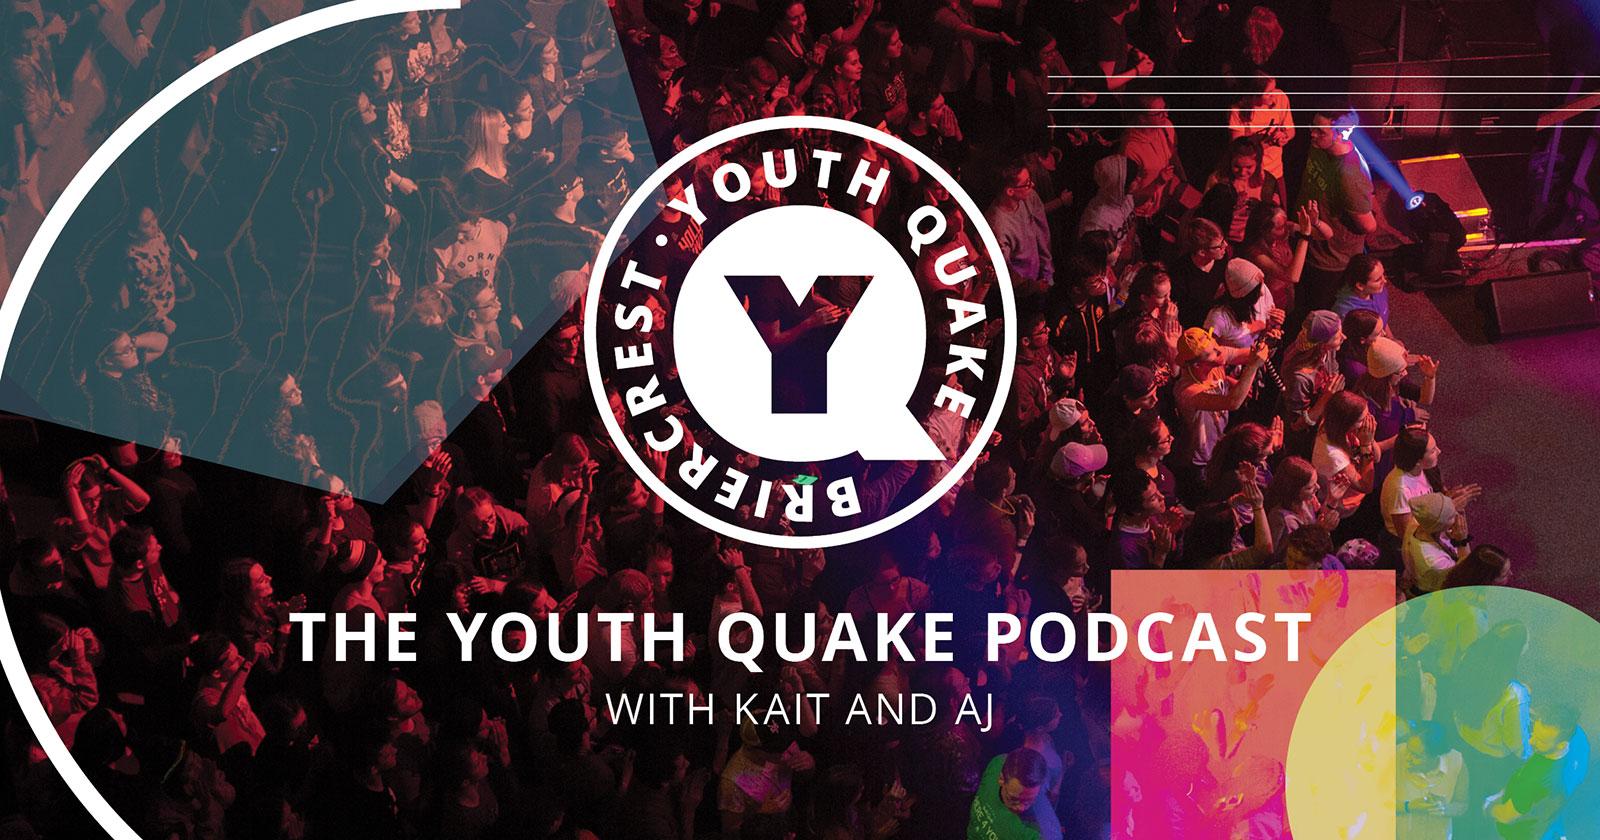 YQ Podcast graphic